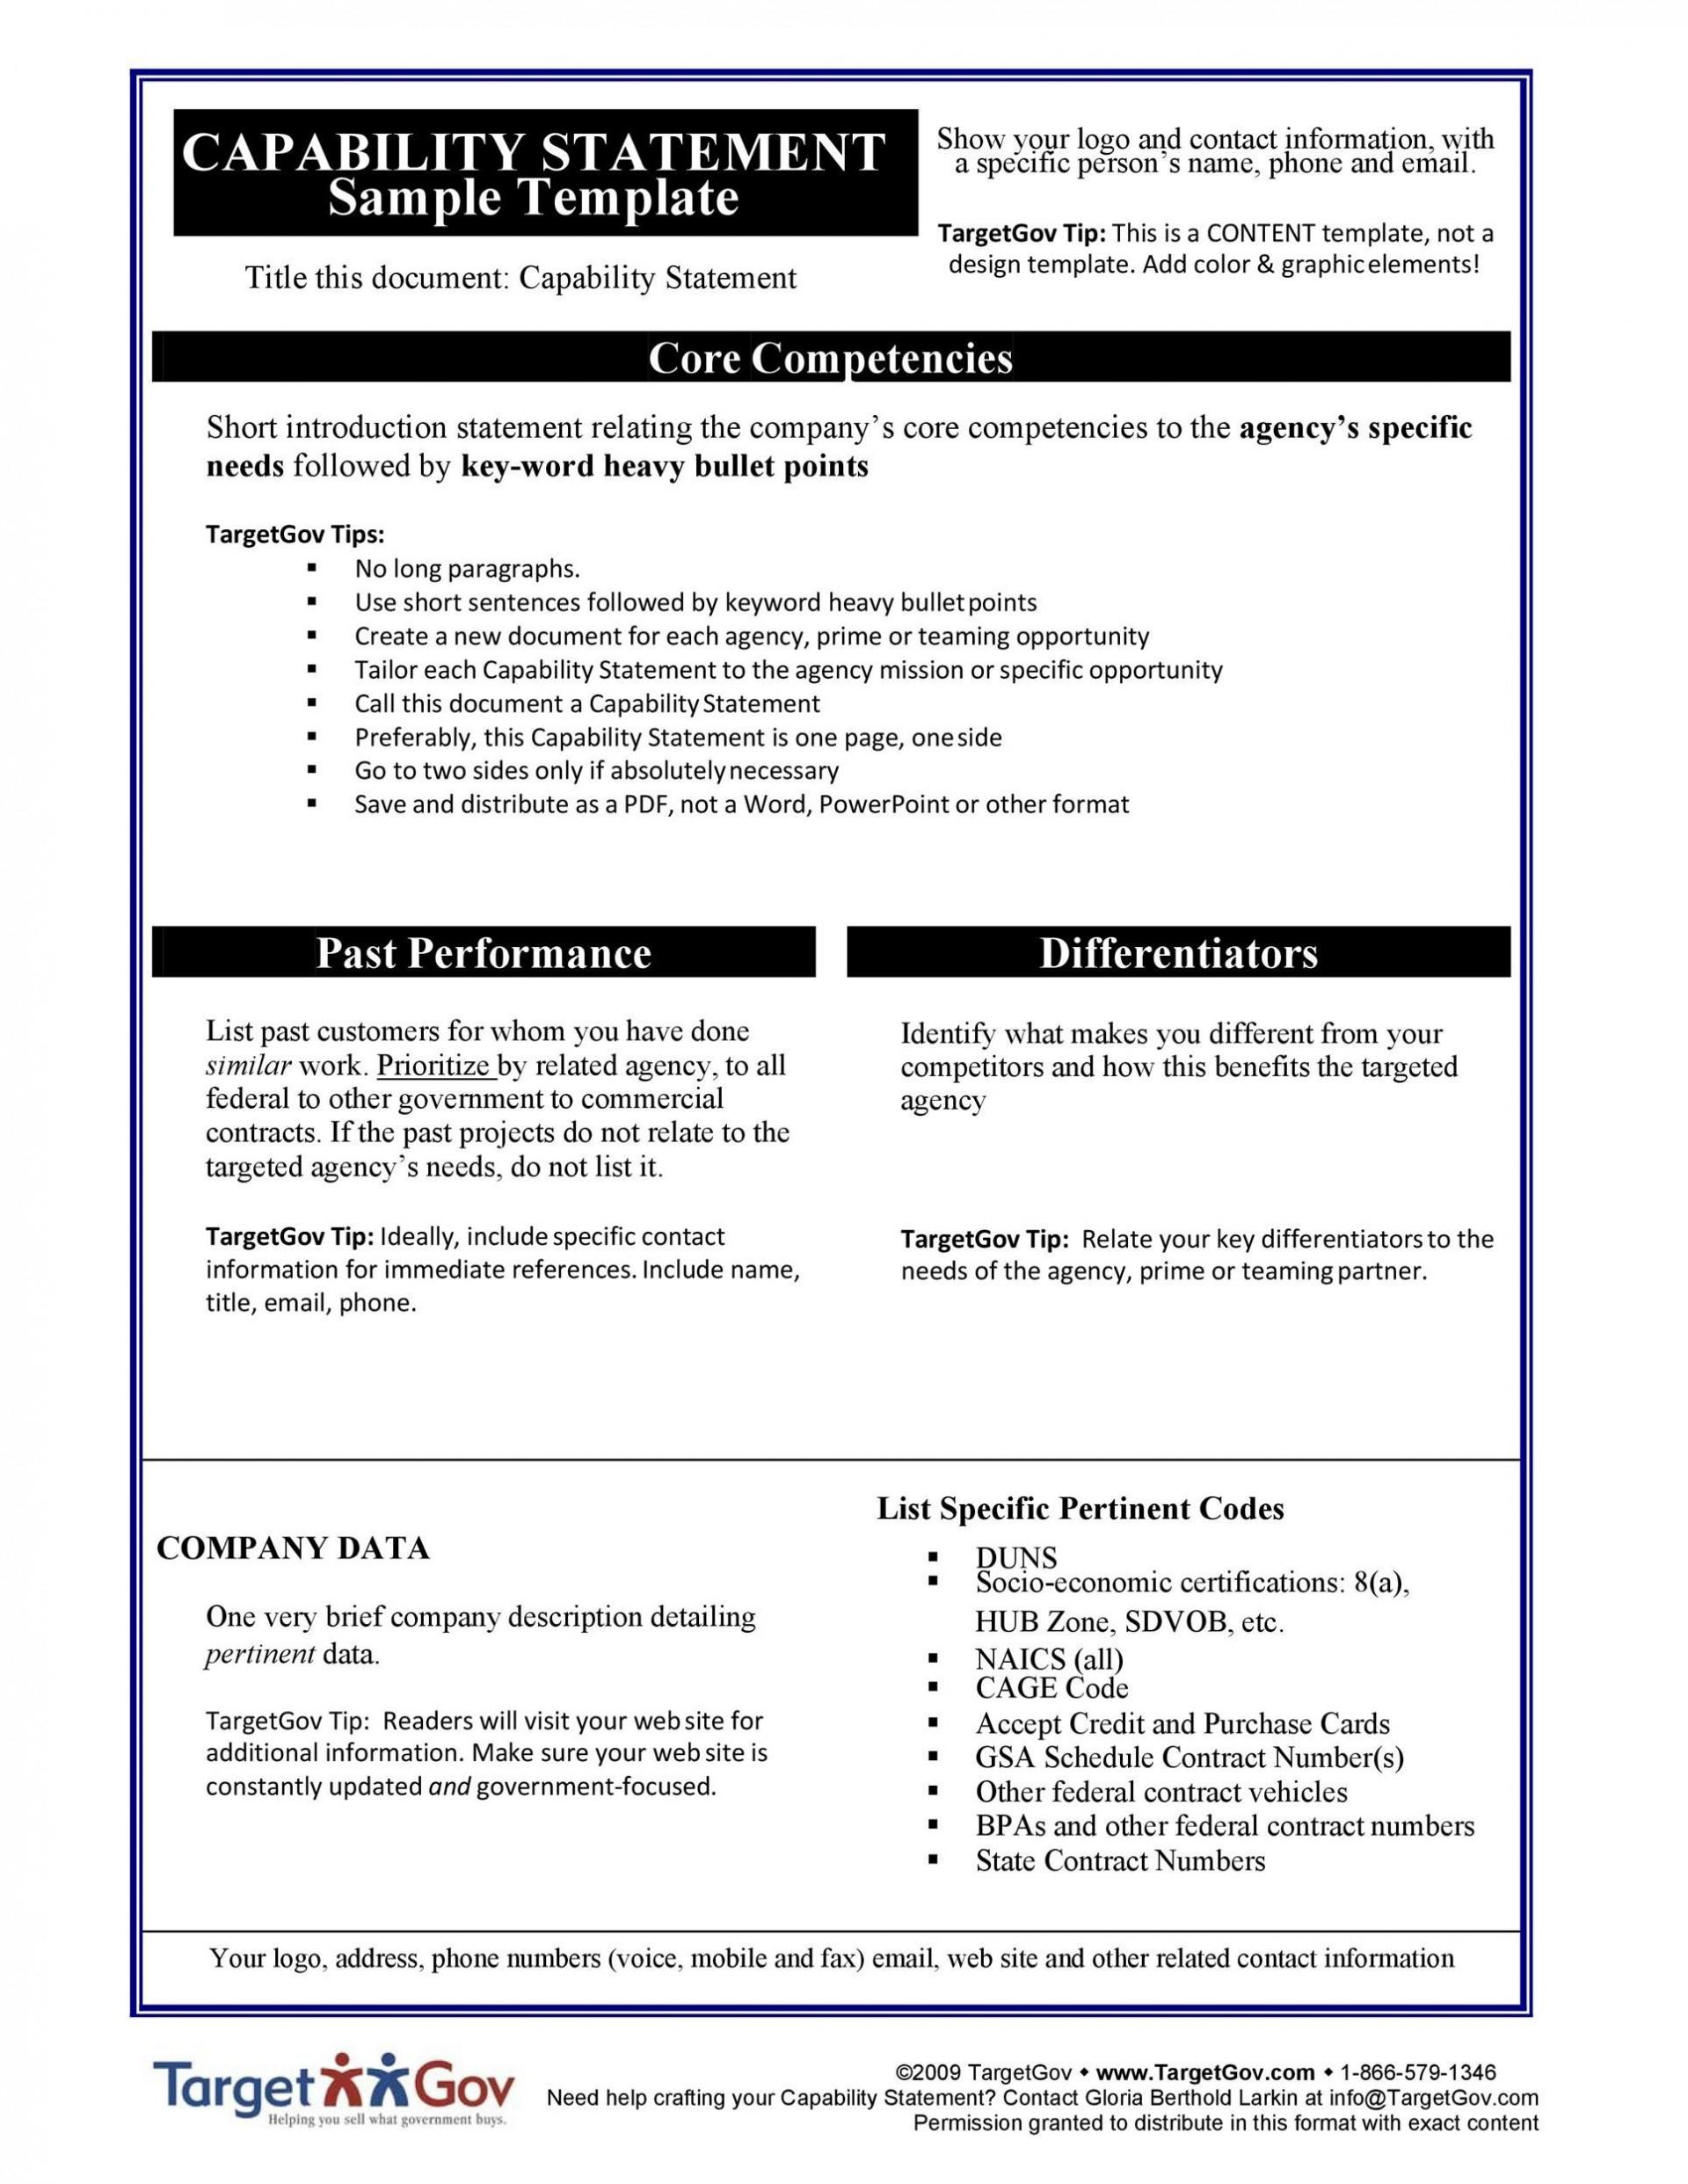 003 Breathtaking Capability Statement Template Free Sample  Word Editable Design1920